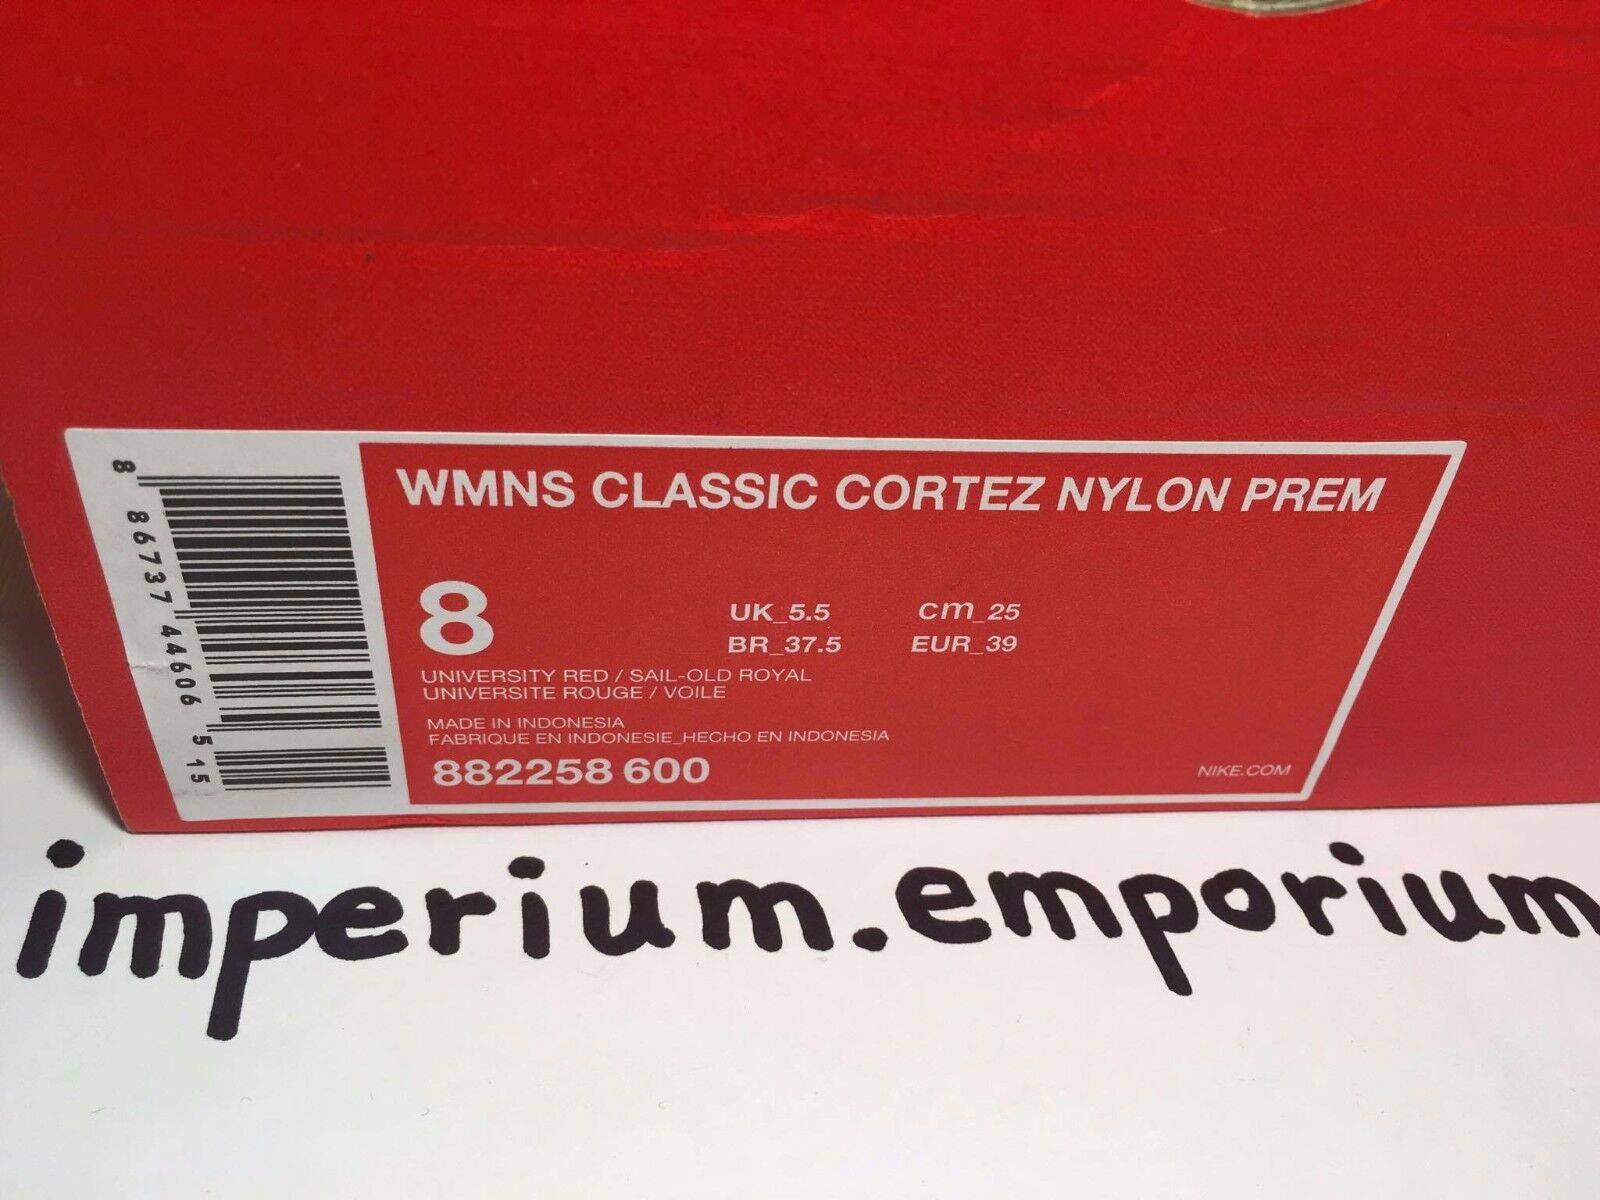 Nike Damen klassisch cortez Nylon Kinderwagen Turnschuhe/Sneakers 4 Größe EU 4 Turnschuhe/Sneakers & 5 2fd5a9